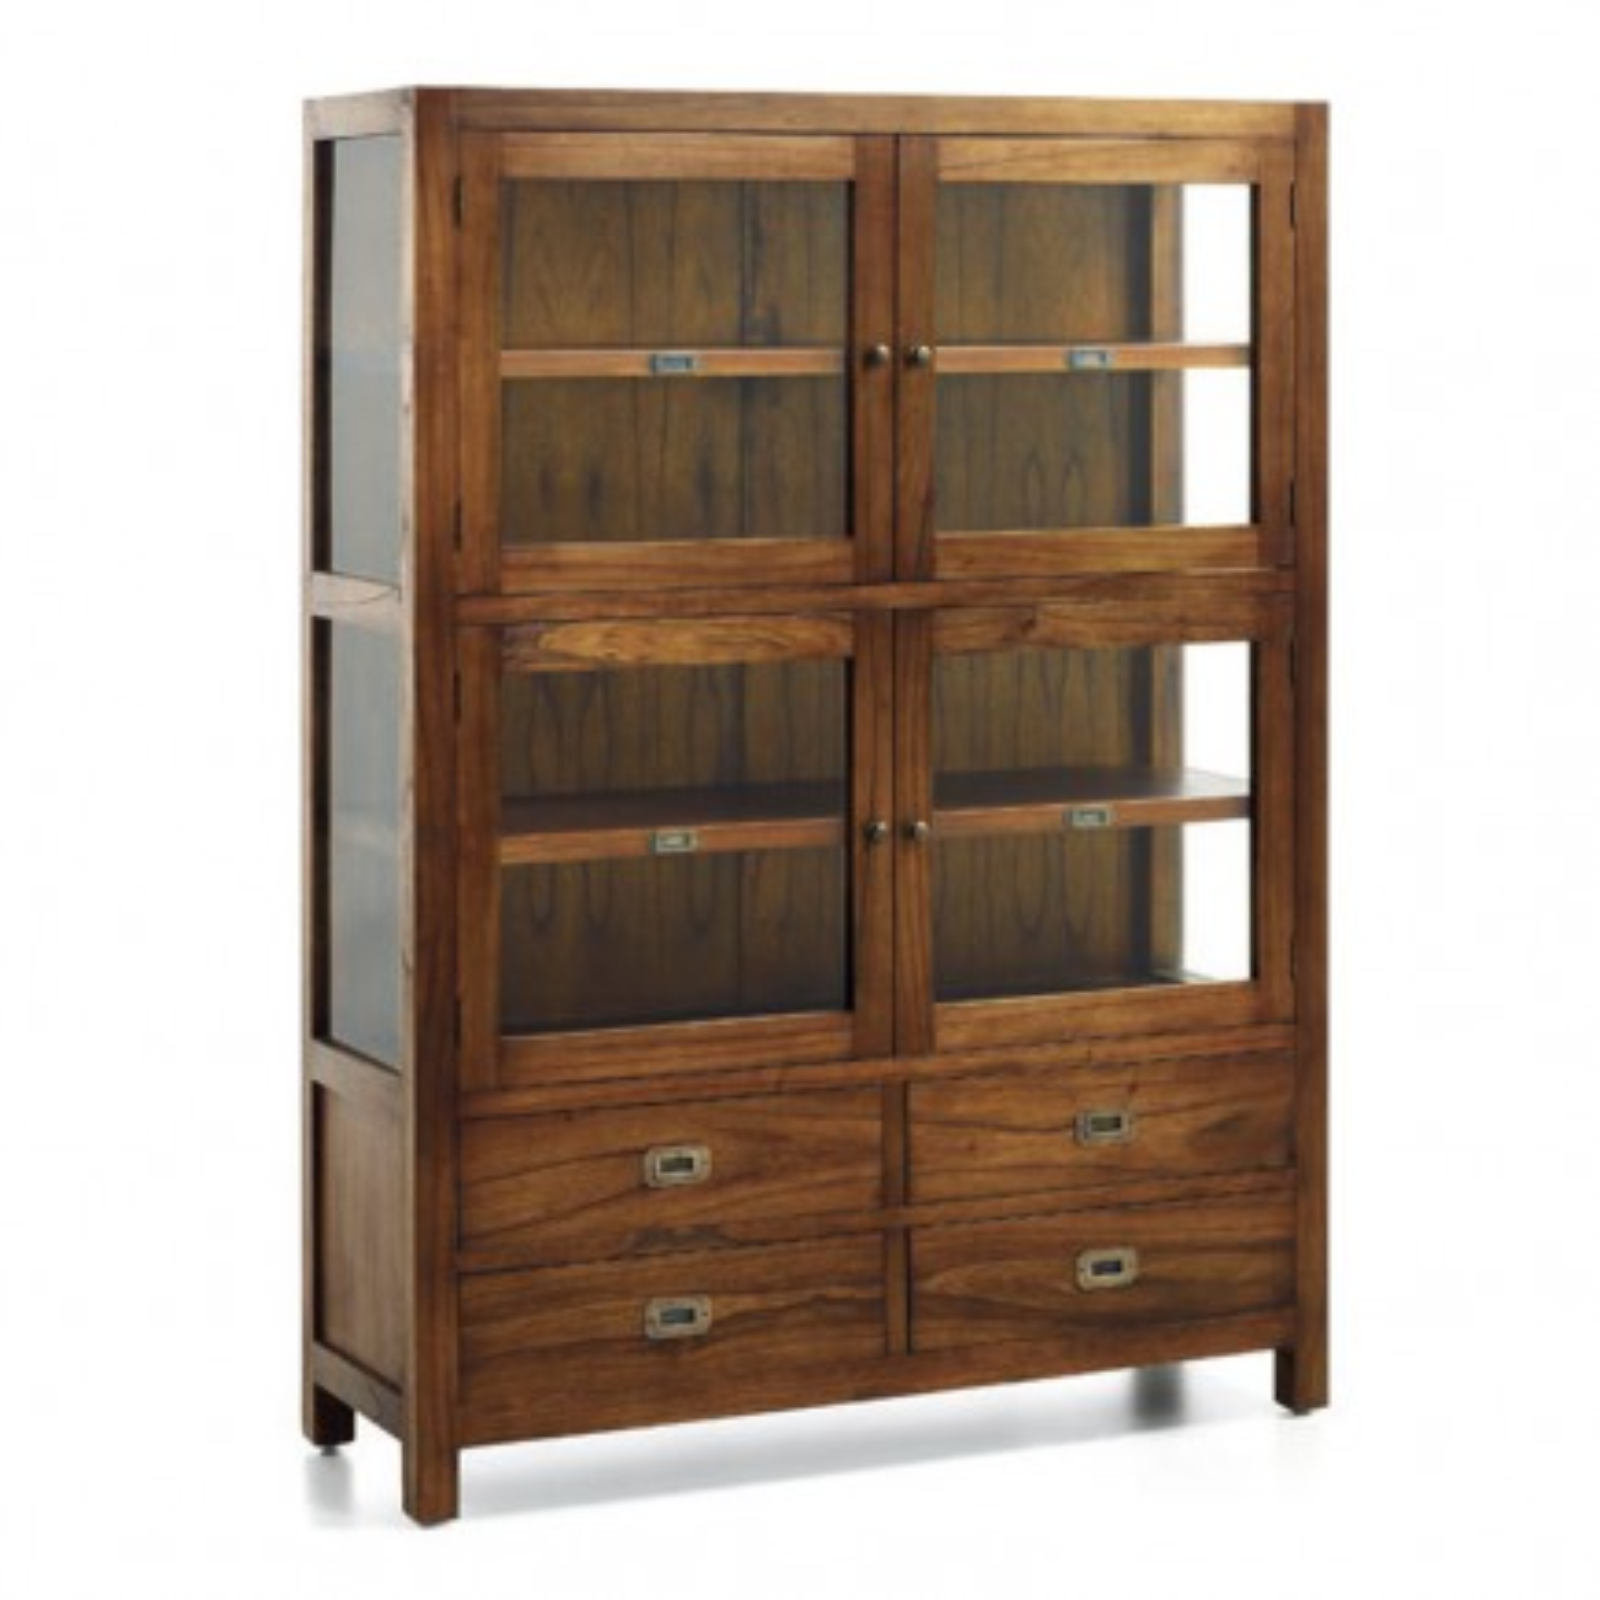 Vitrine 4 Portes Tali Mindy - meuble bois exotique